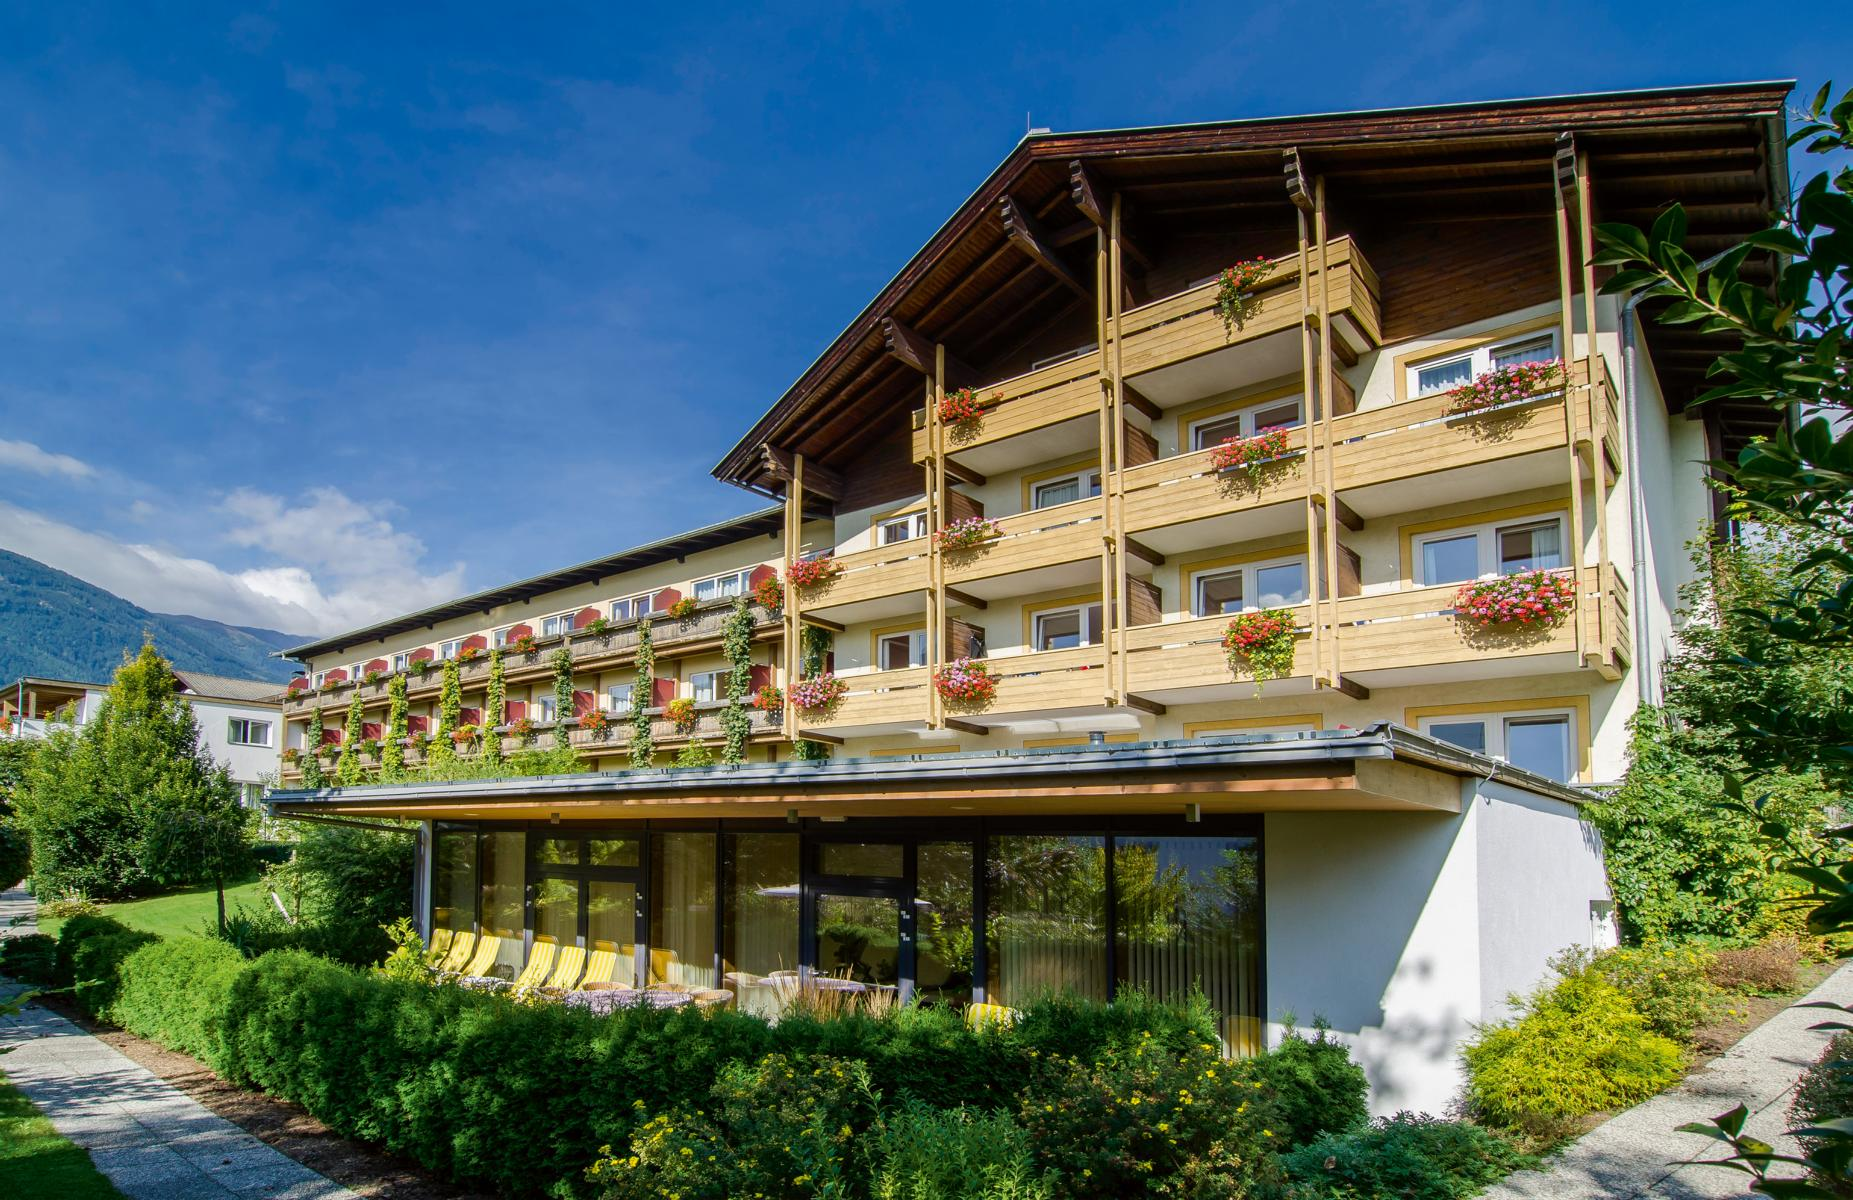 Hotel Moarhof (Foto: Dolomitengolf)